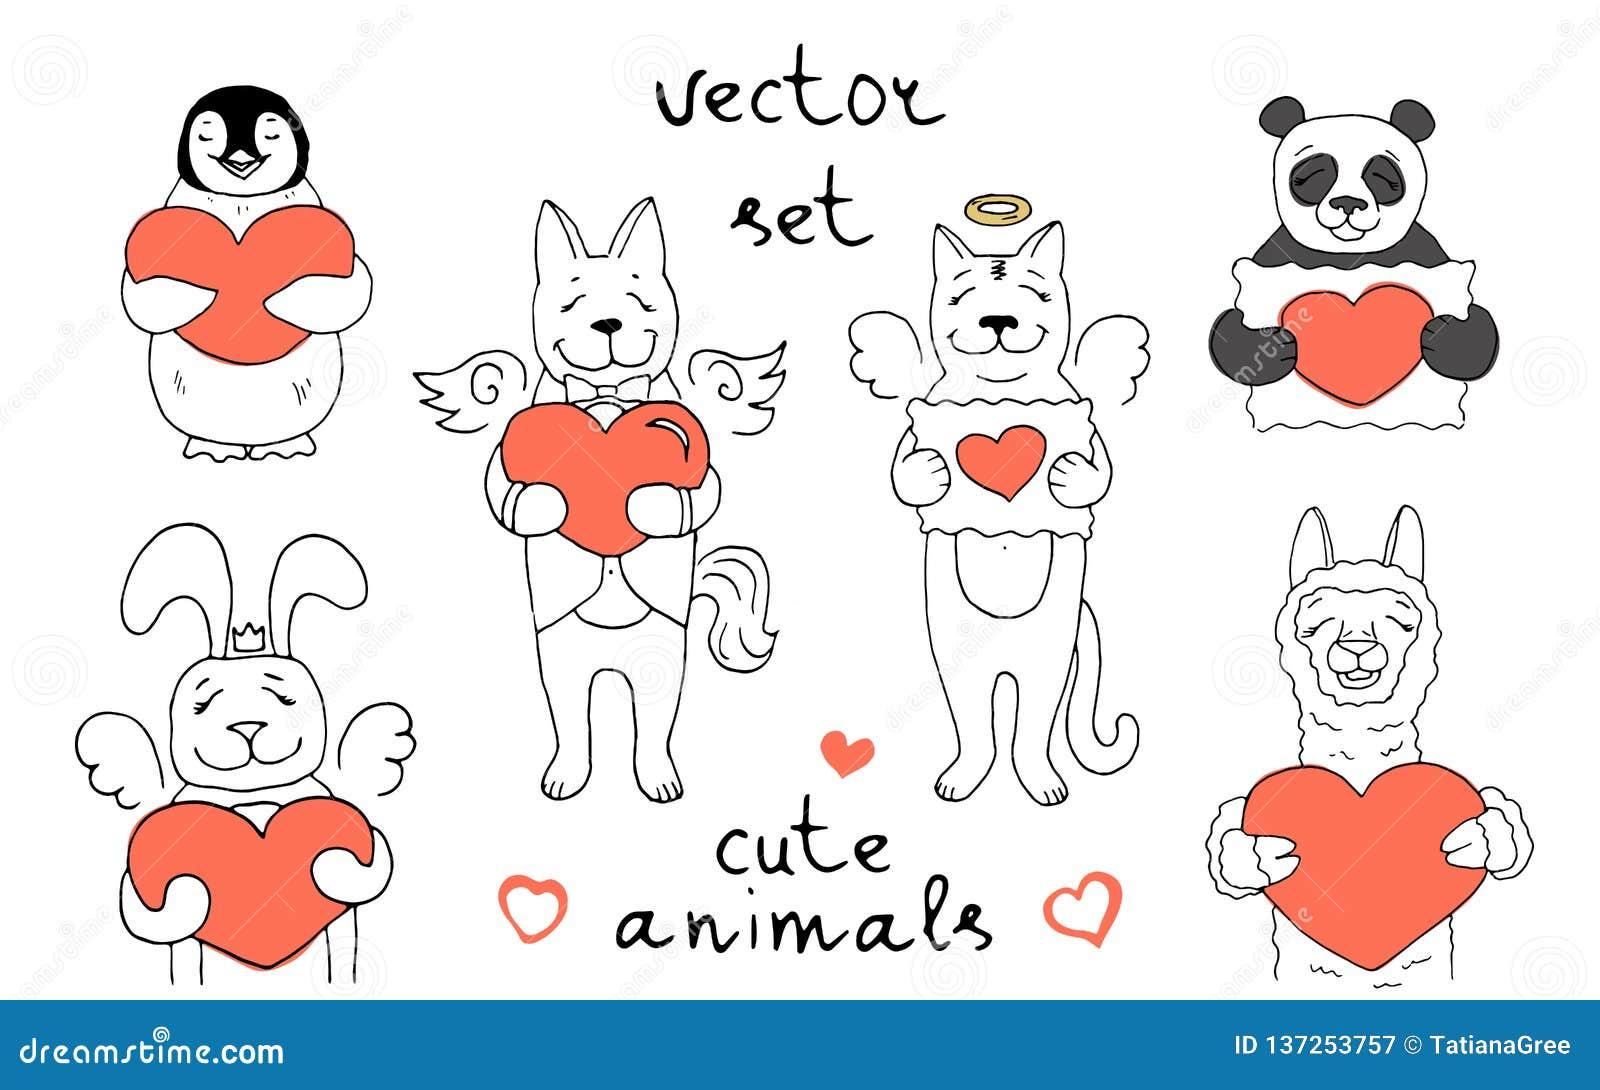 Fije de 6 caracteres del vector de diversos animales lindos